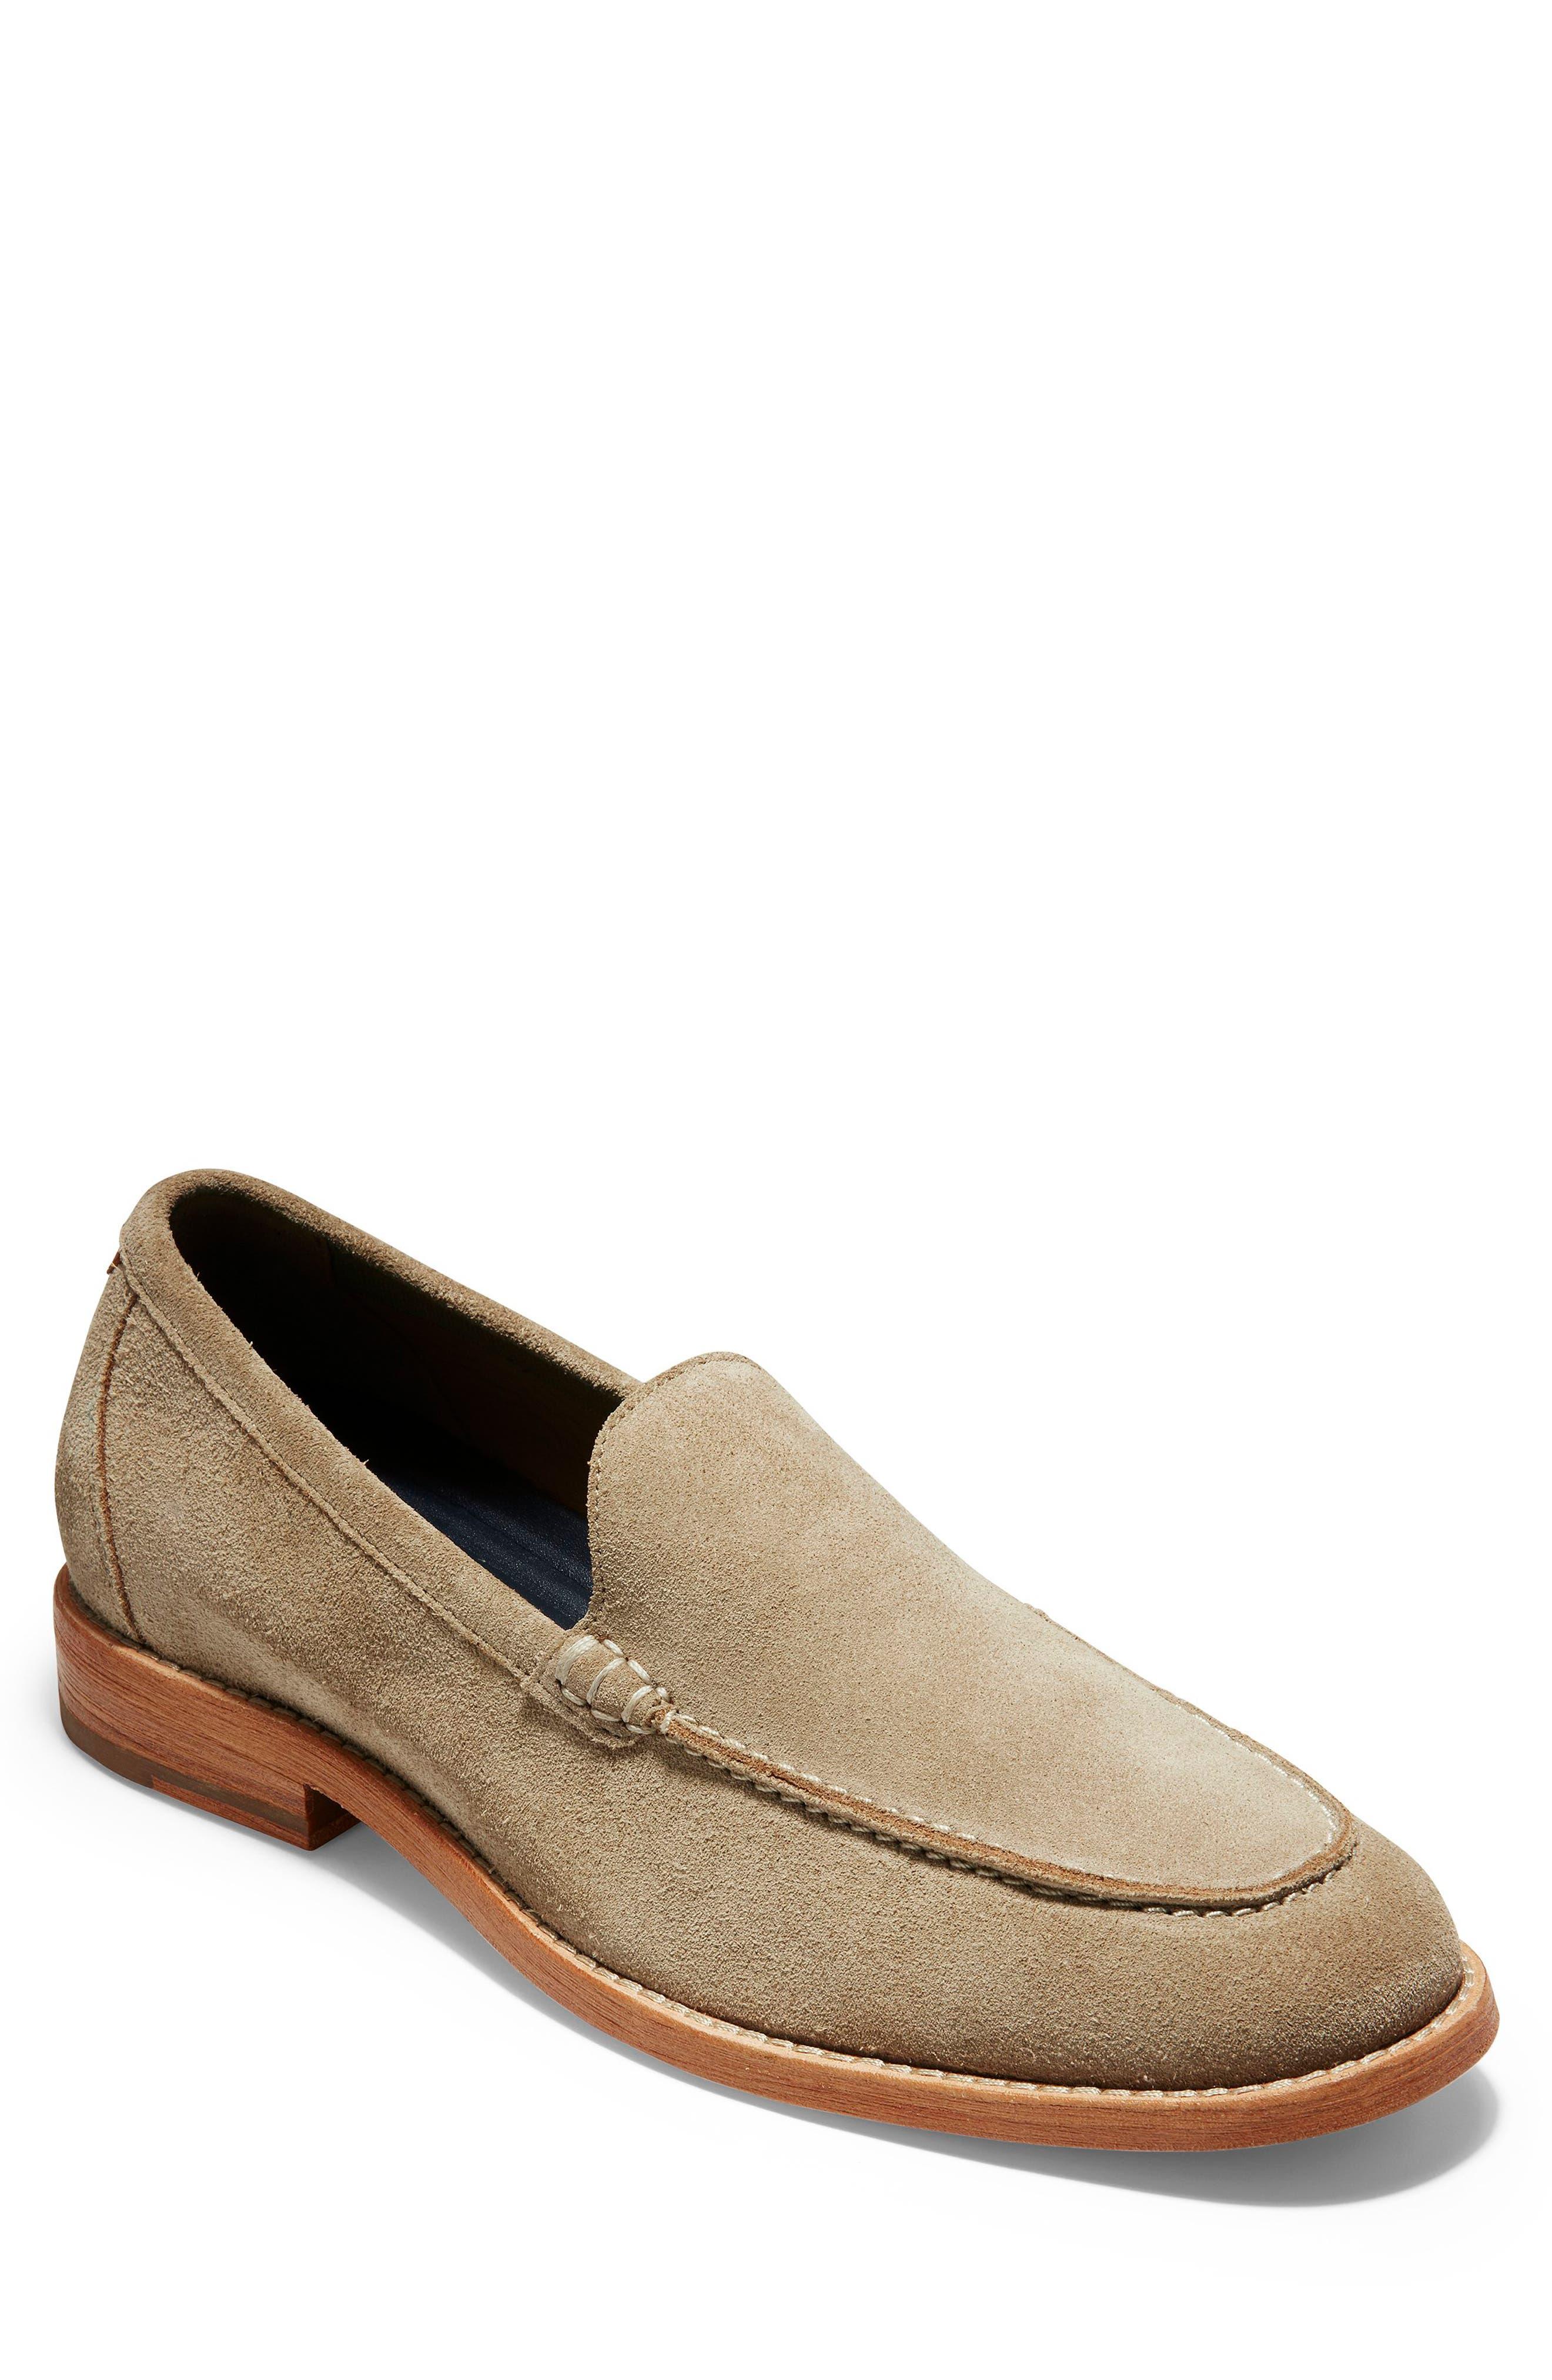 Cole Haan Feathercraft Grand Venetian Loafer, Beige